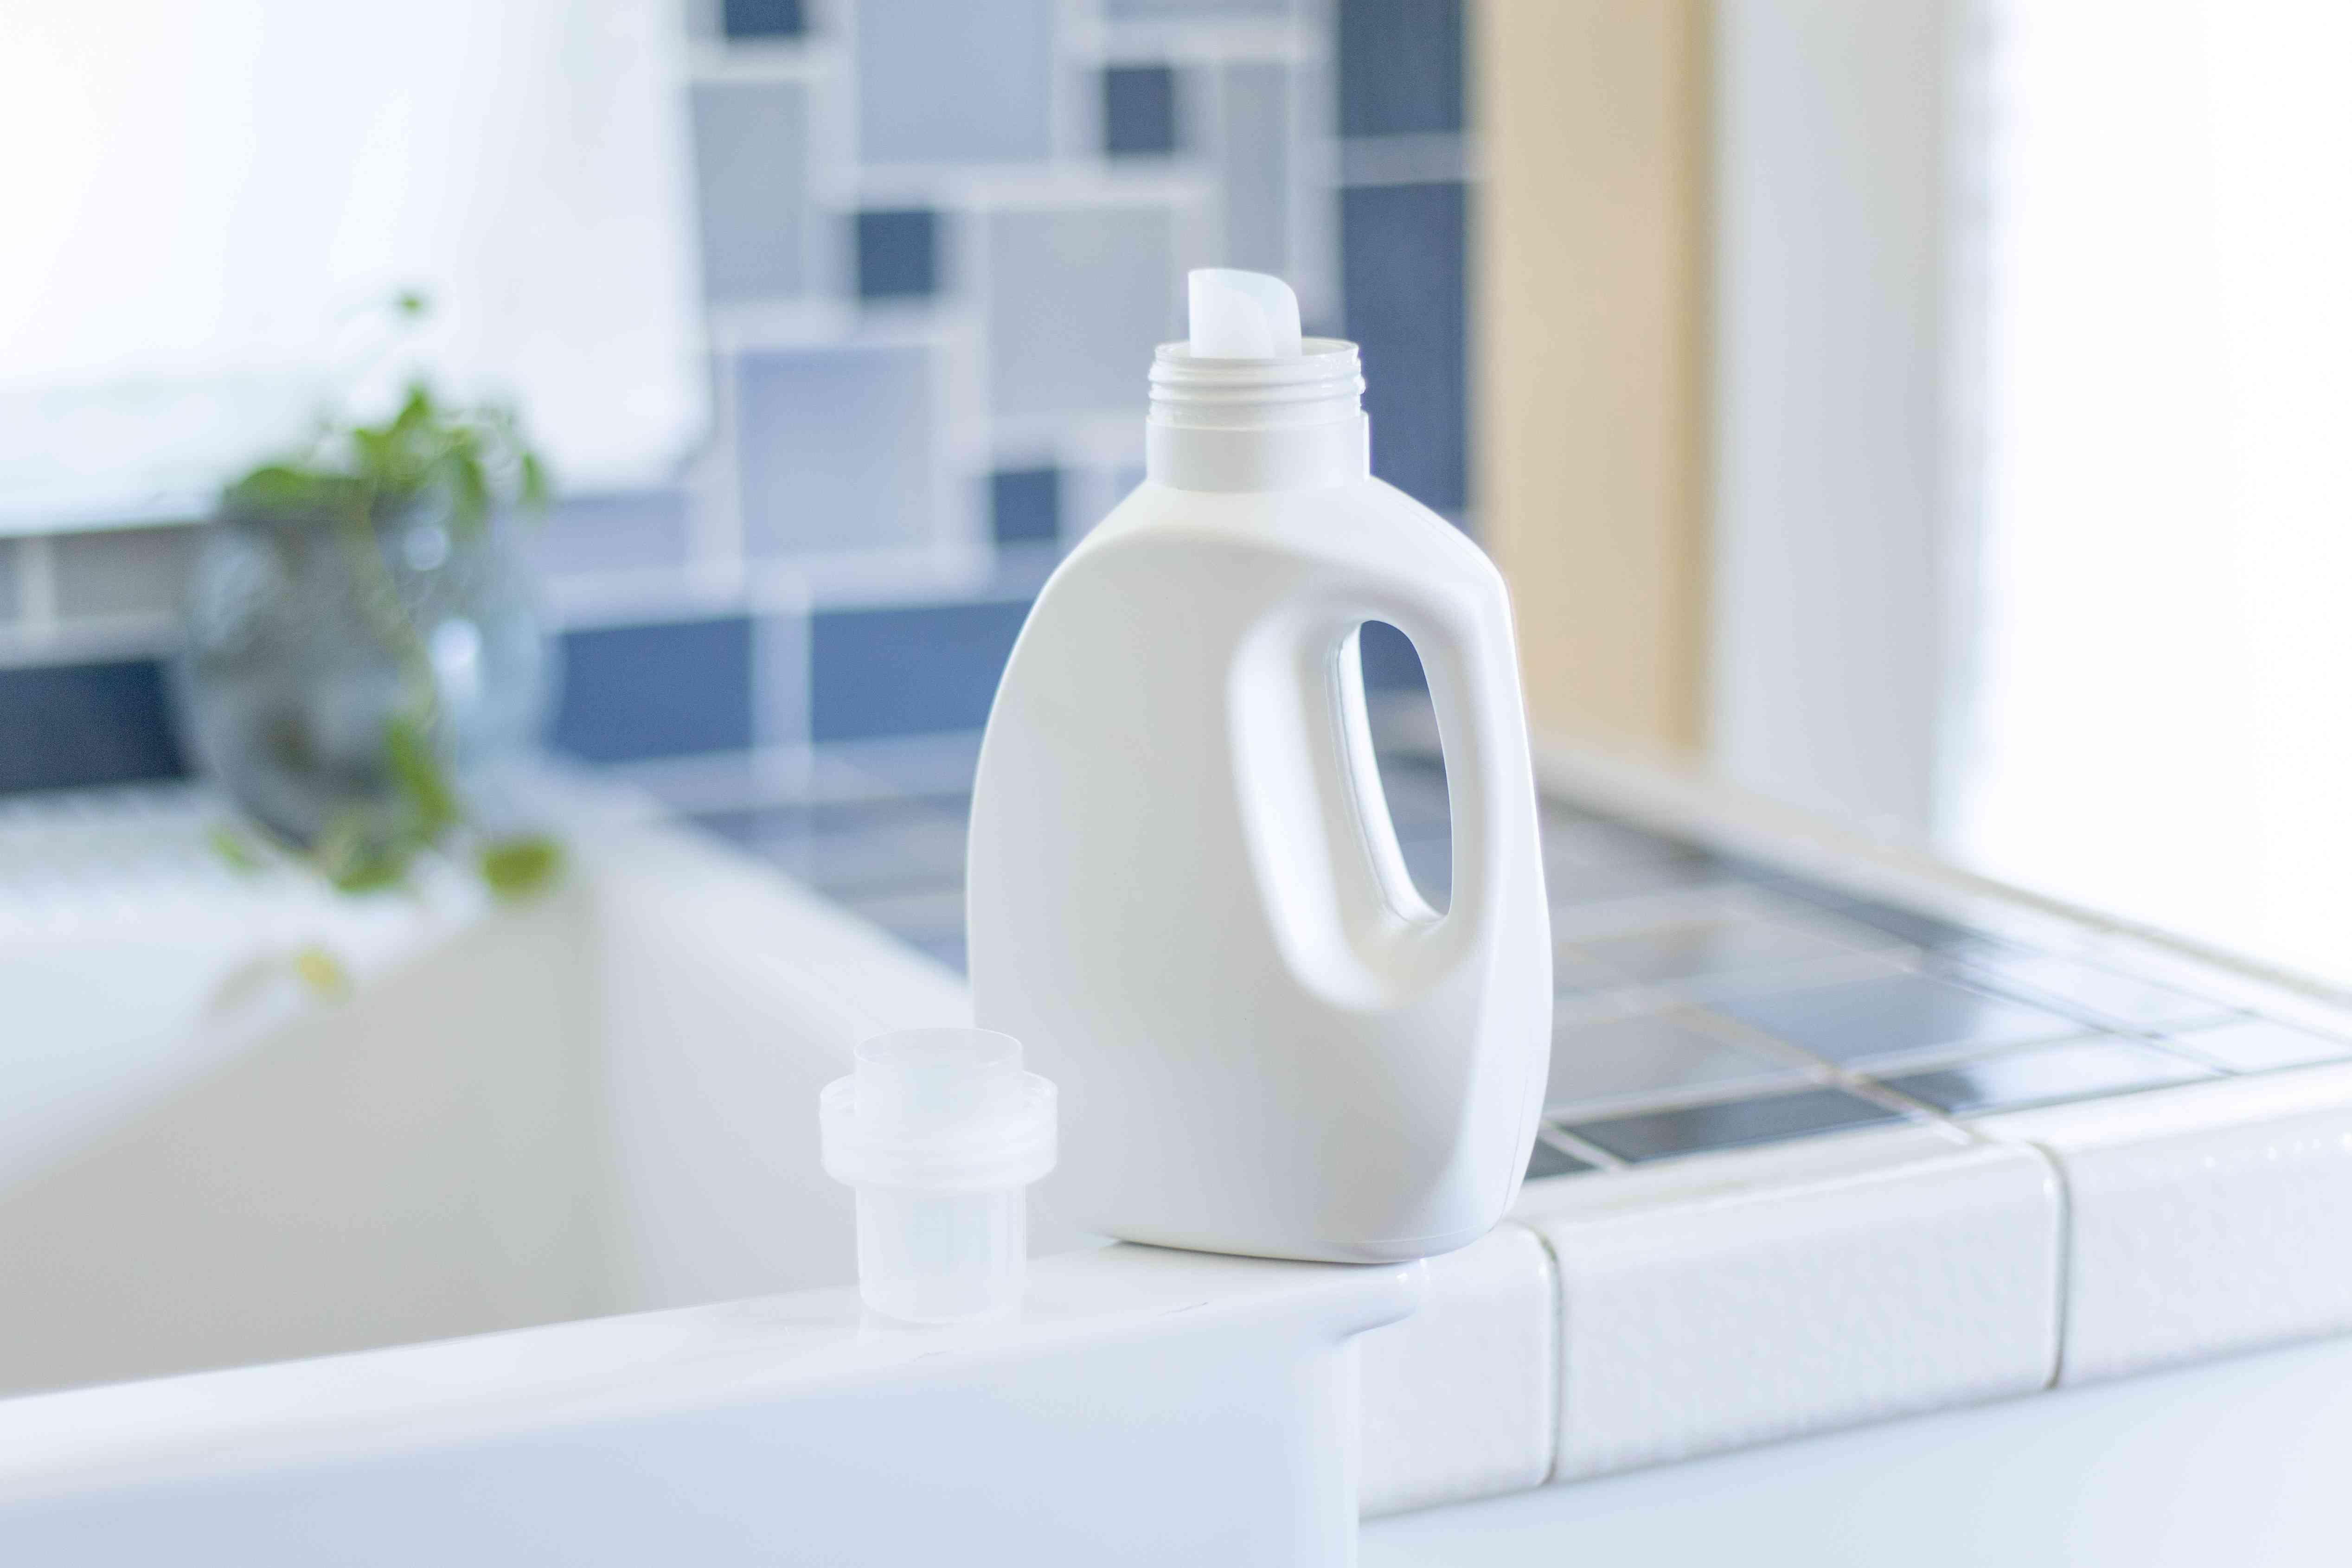 bottle of laundry detergent